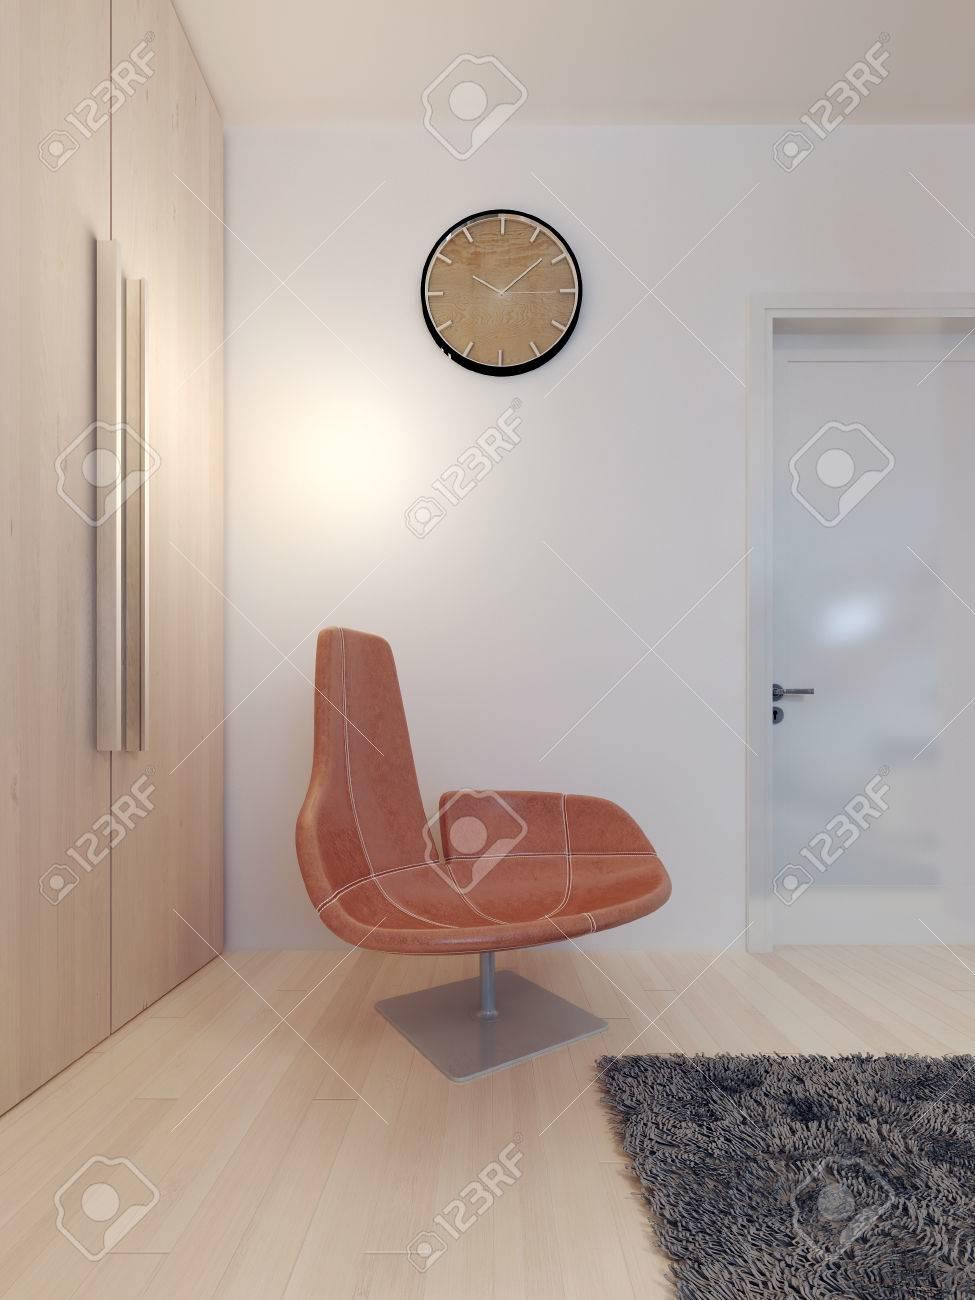 Fest Ei Stuhl In Einem Modernen Schlafzimmer Leder Orange Stuhl 3d